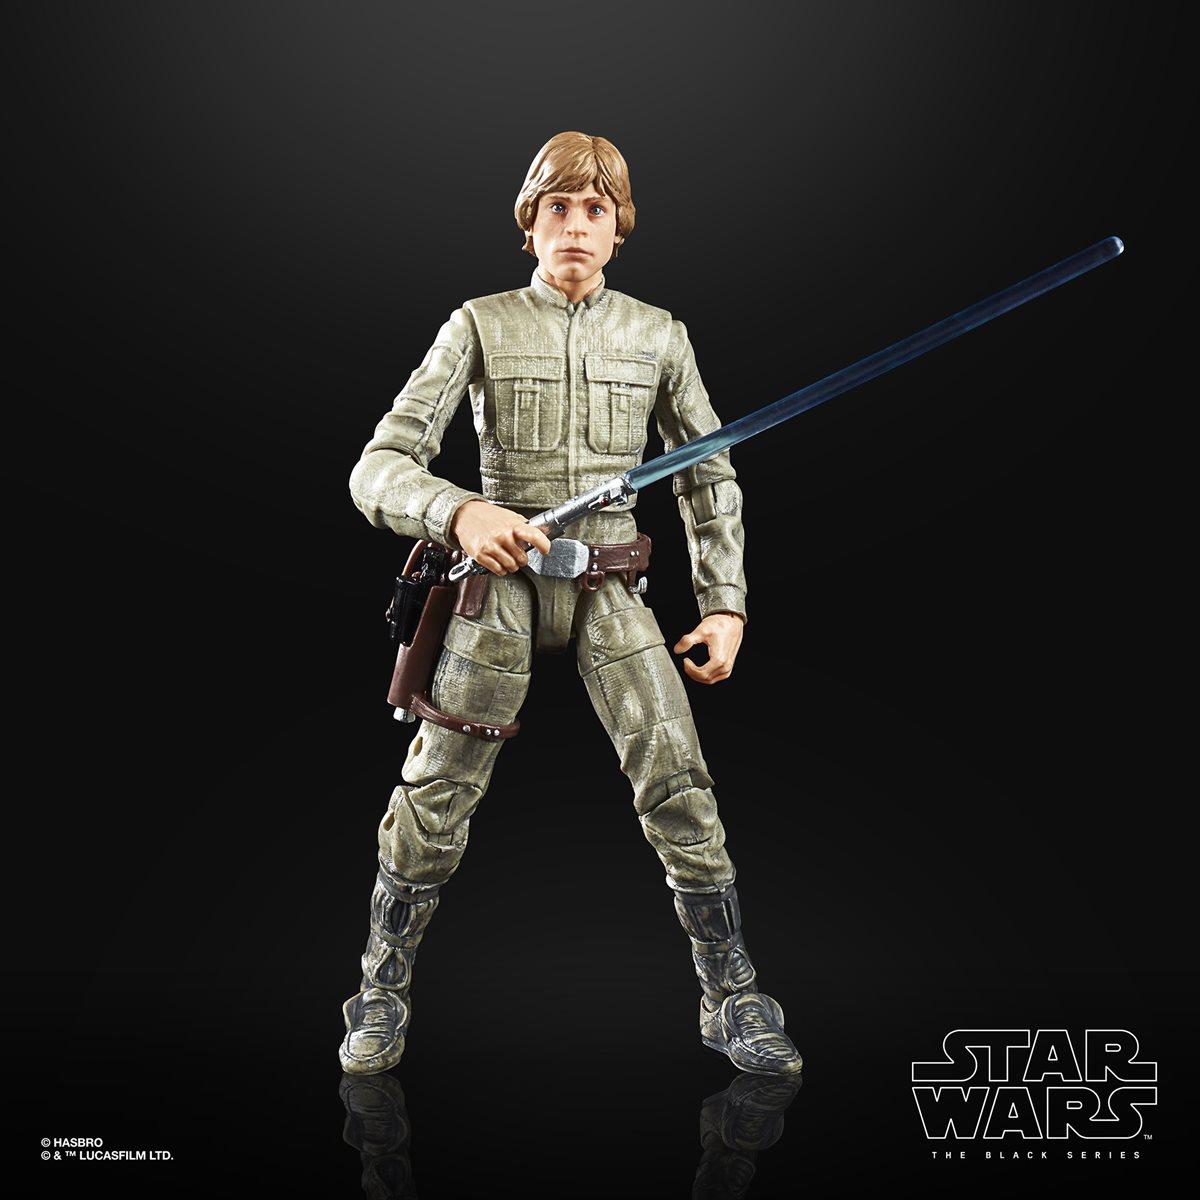 Star Wars The Black Series ESB 40th Anniversary 6-Inch Luke Skywalker Dagobah Ac